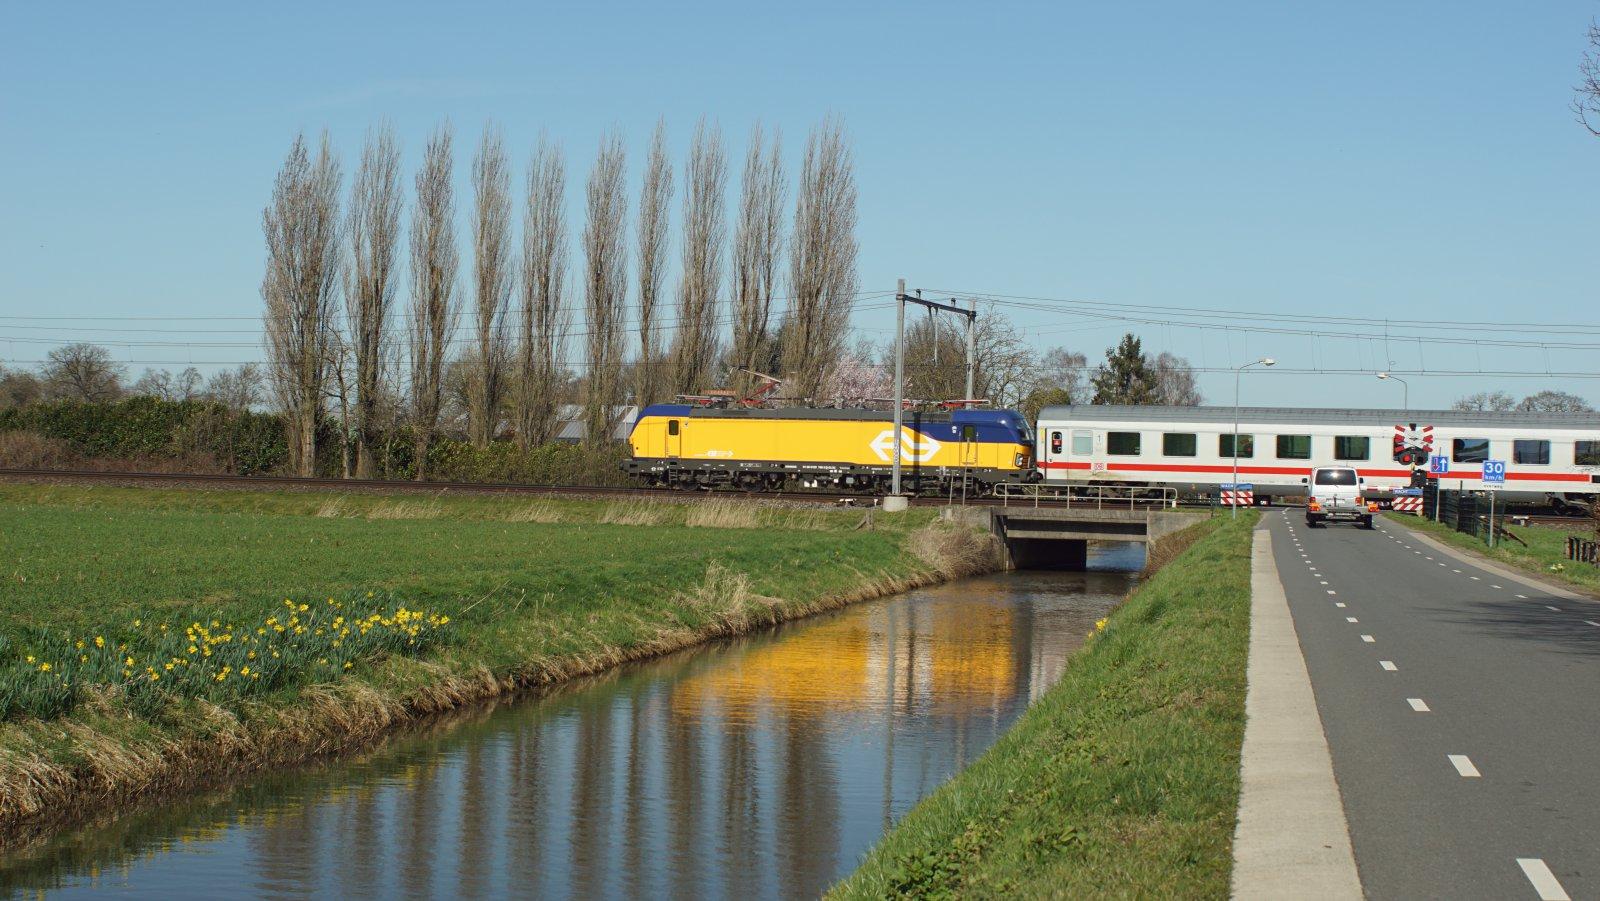 NS 193 766 ri Apeldoorn